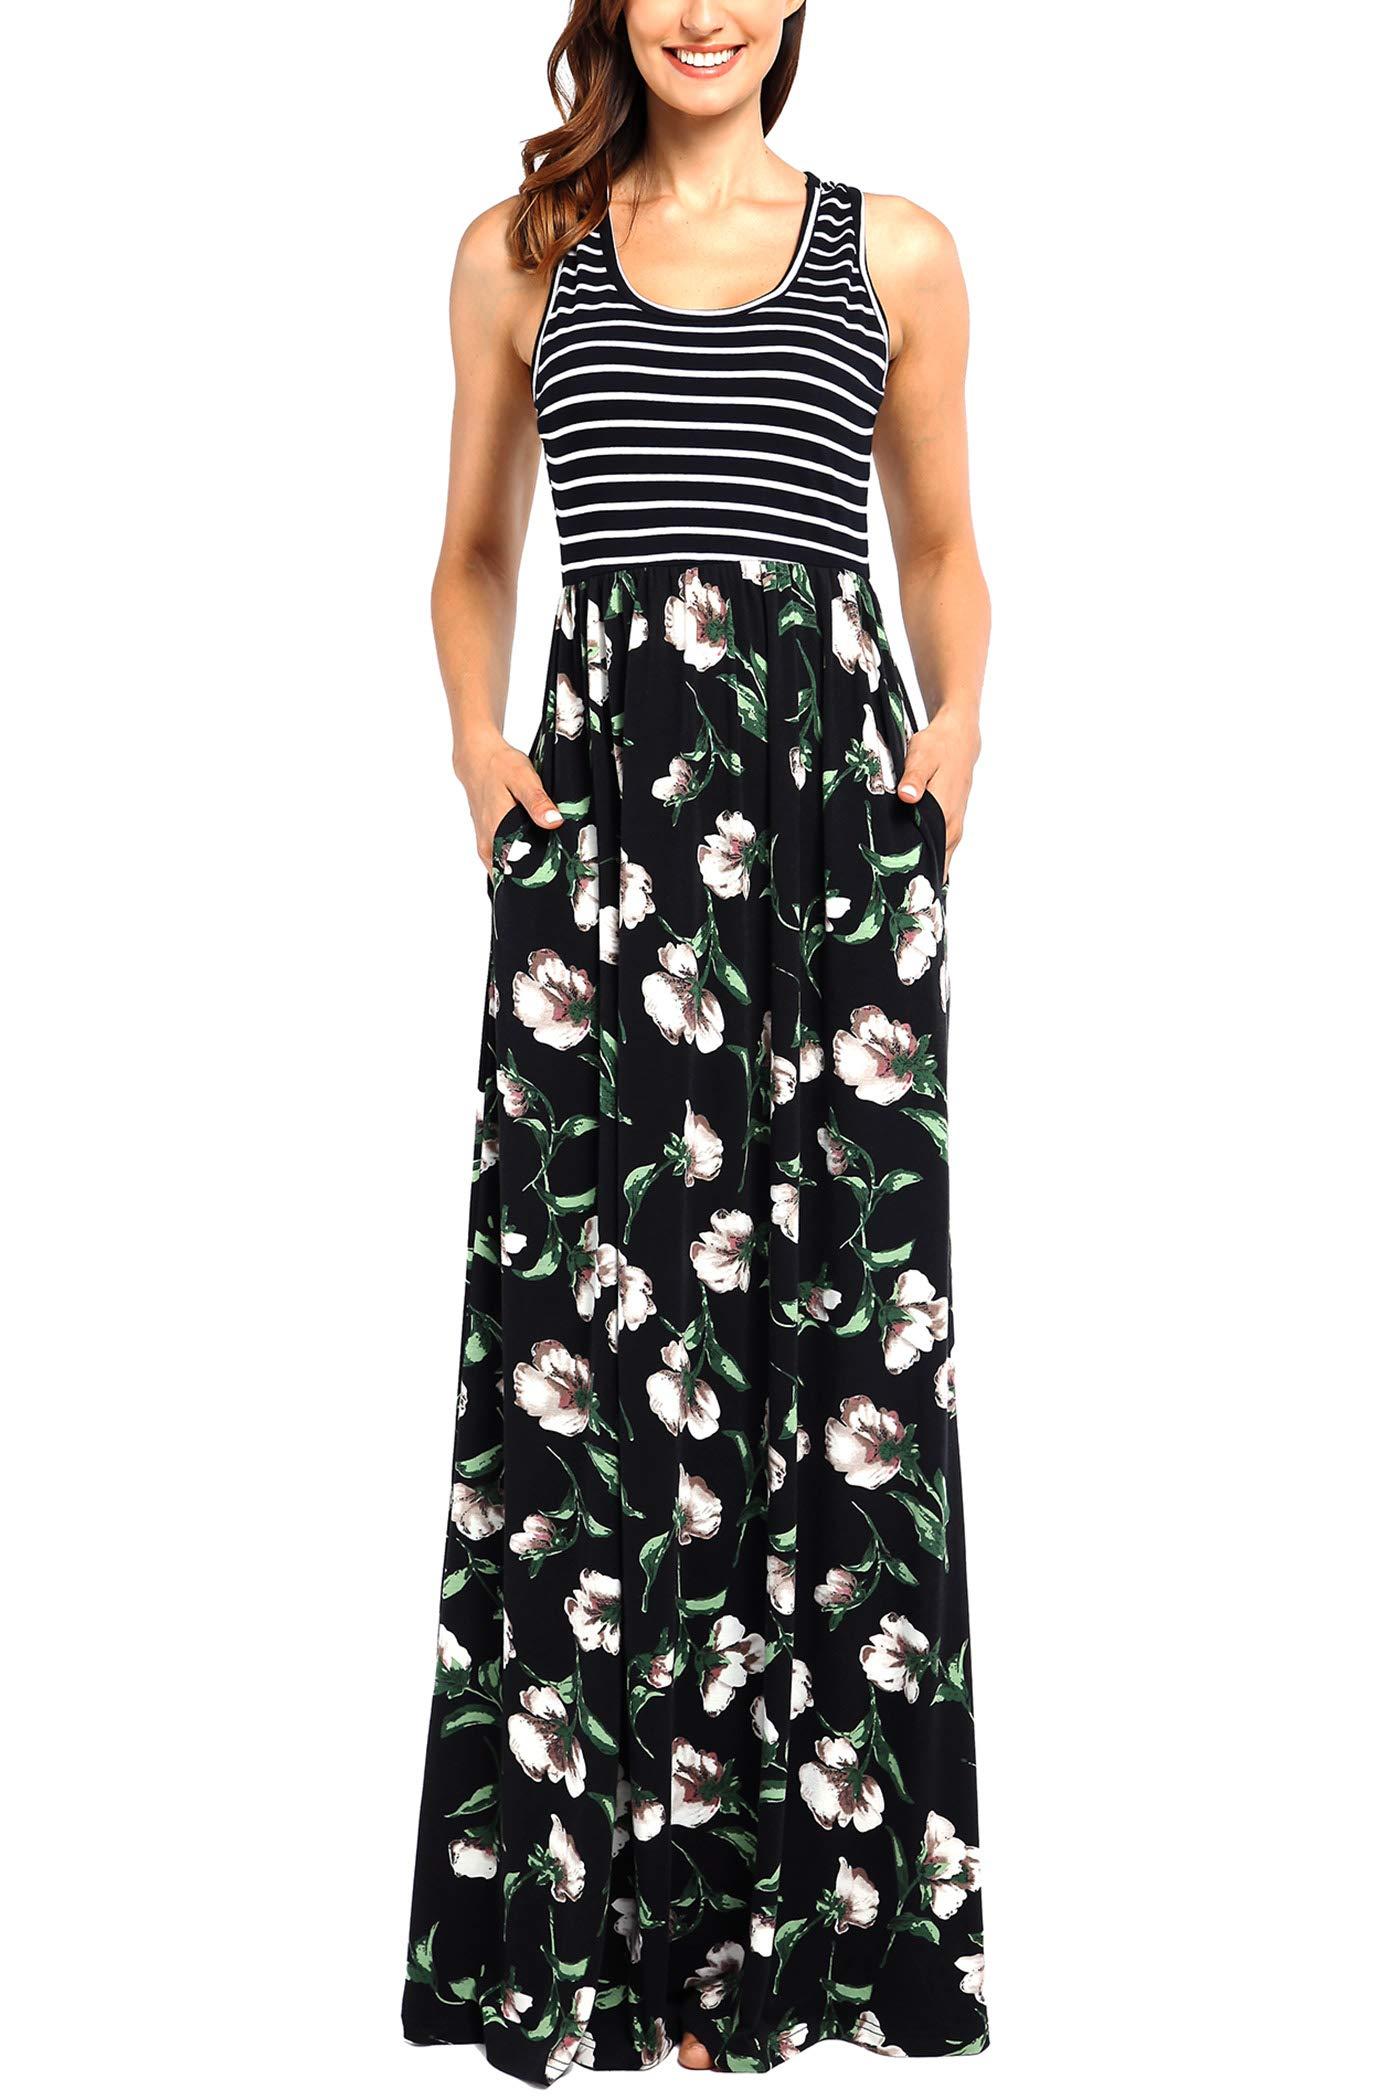 Comila Tank Maxi Dresses for Women Plus Size, Retro Bohemian Style Long Summer Dress Work Office Empire Waist Classic Floral A Line Maxi Dress Black XXL (US 18-20)